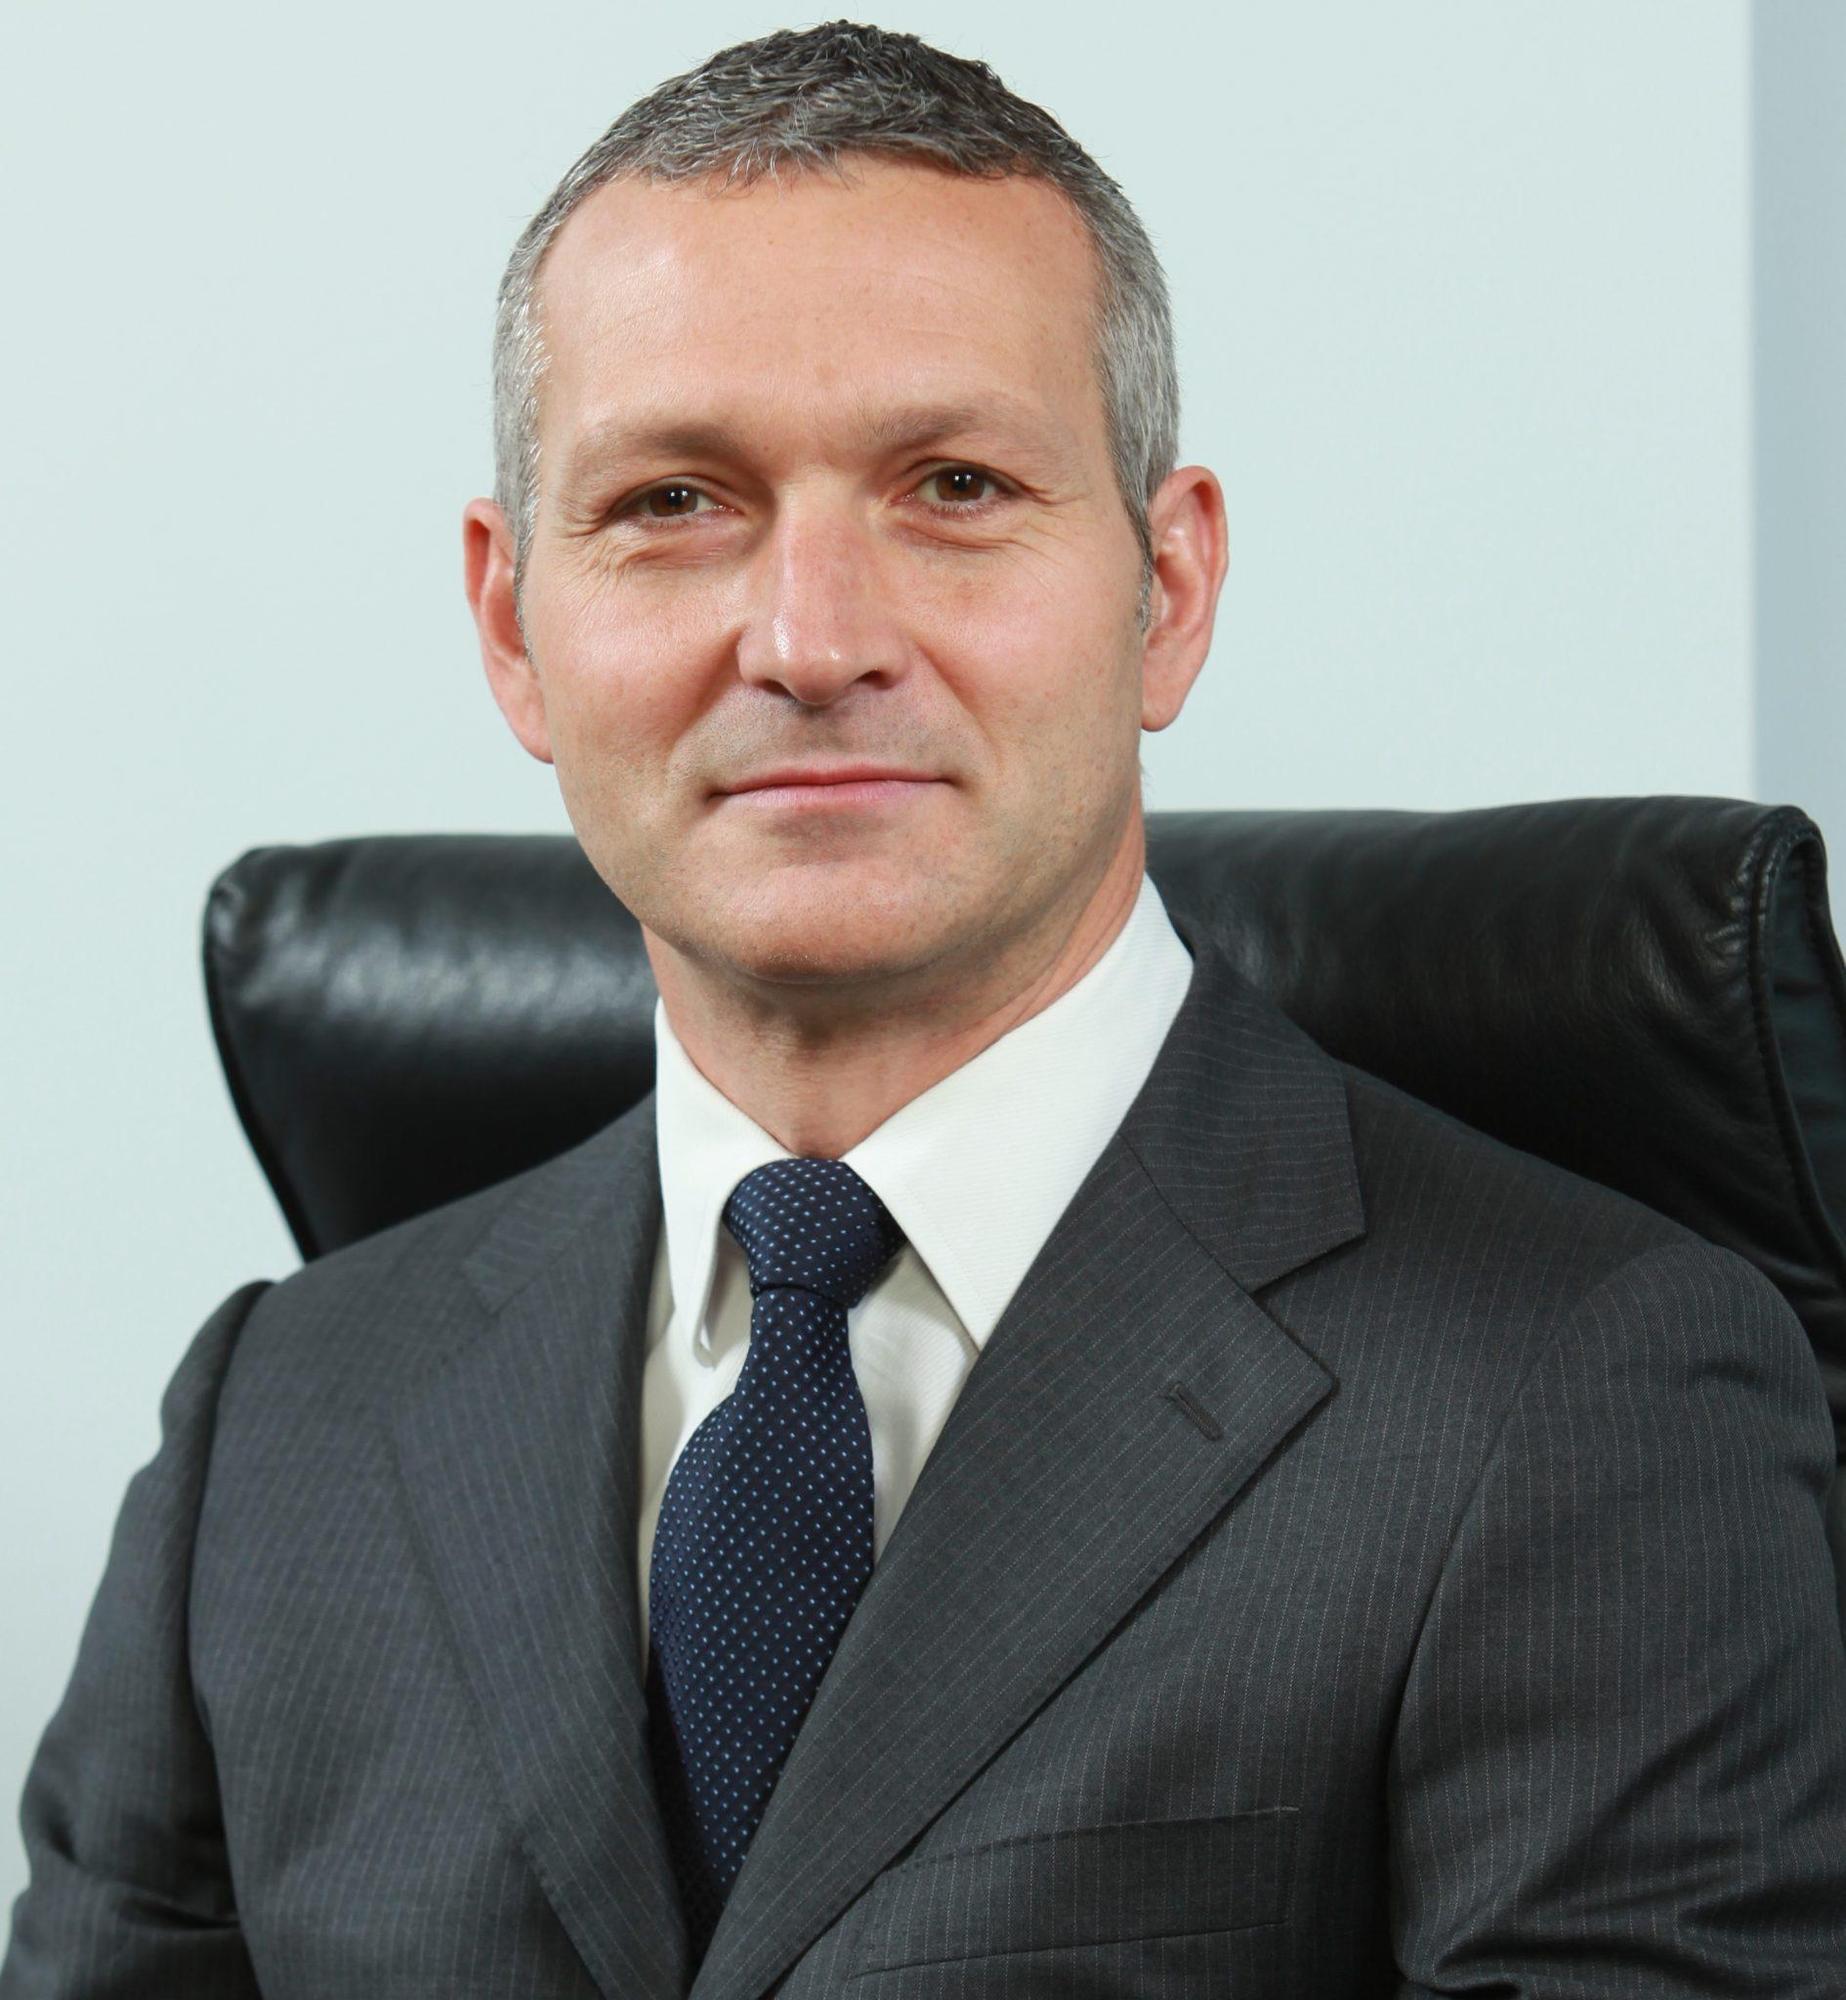 Michel Piguet - Διευθύνων Σύμβουλος Elpedison